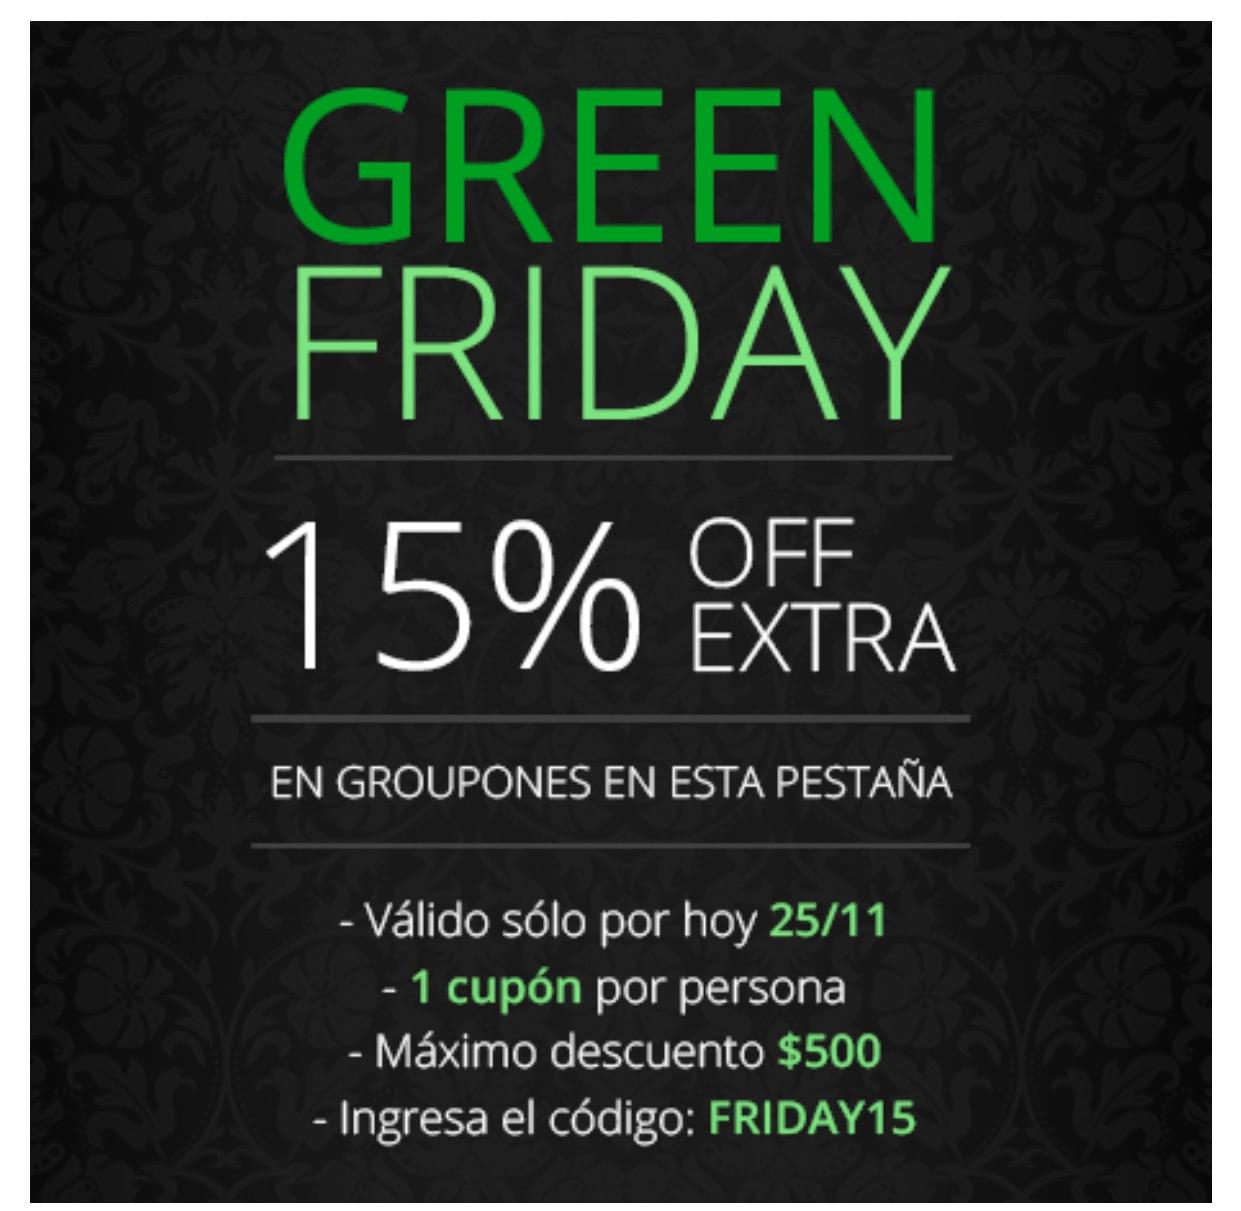 Black Friday 2016 en Groupon: 15% off EXTRA